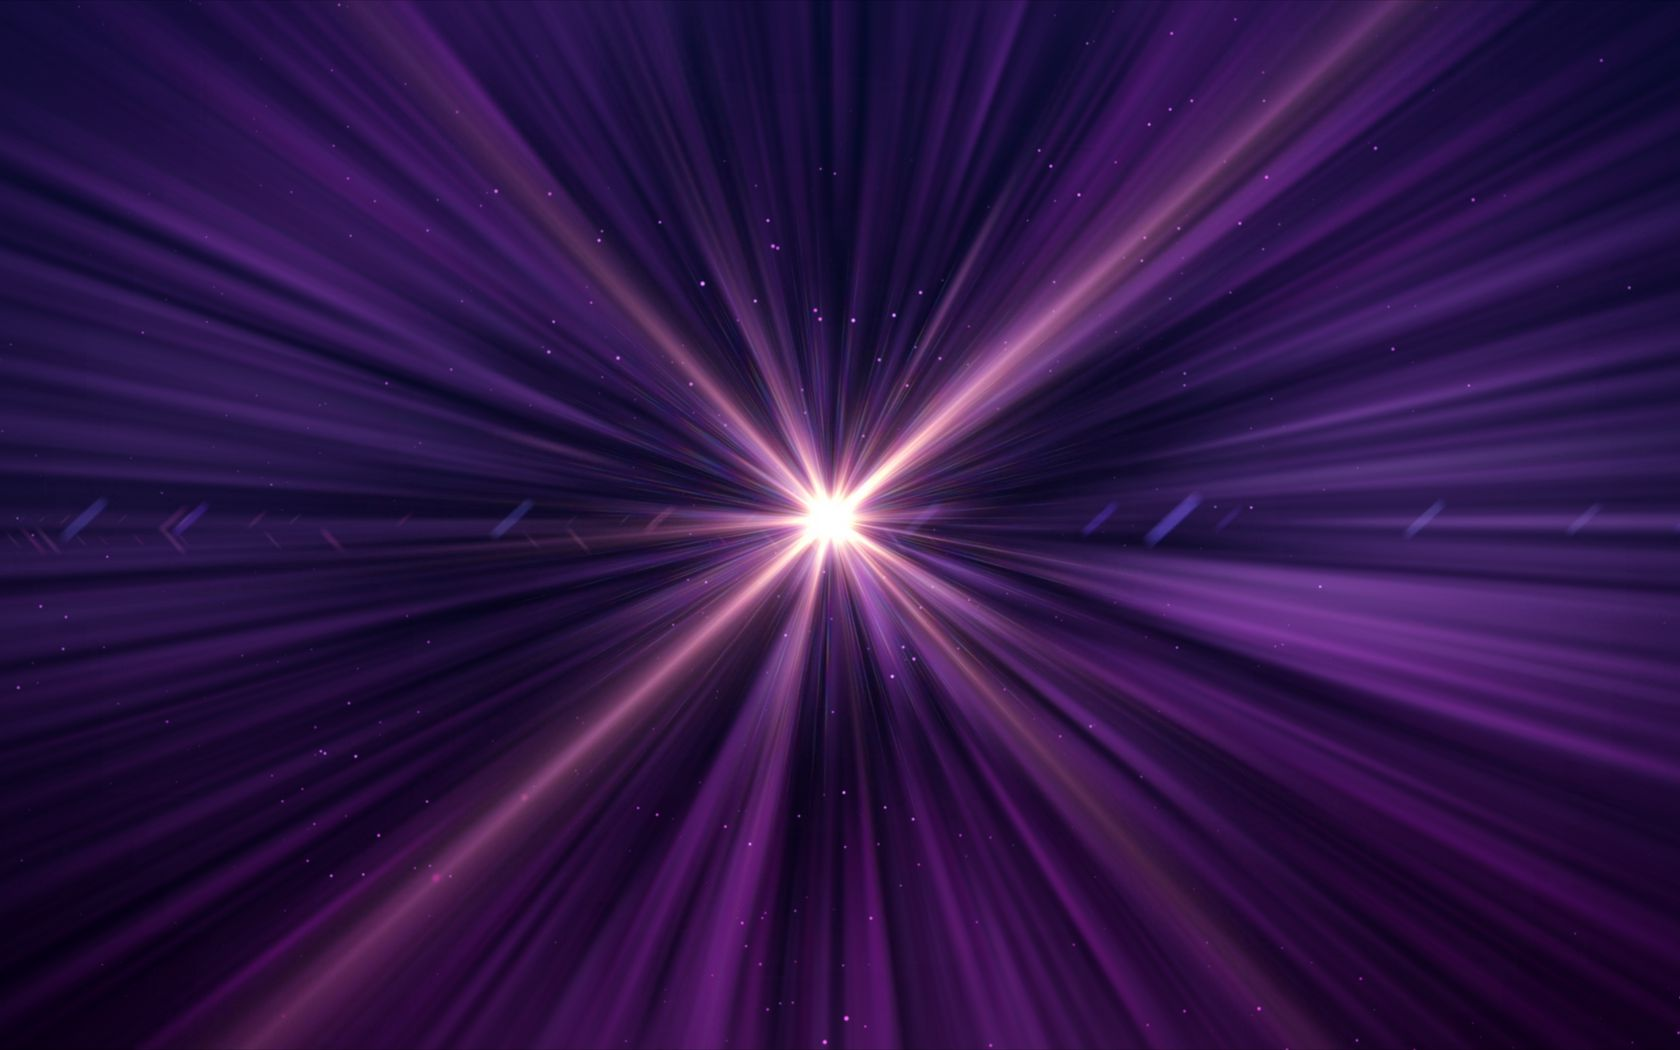 1680x1050 Wallpaper rays, glow, light, purple